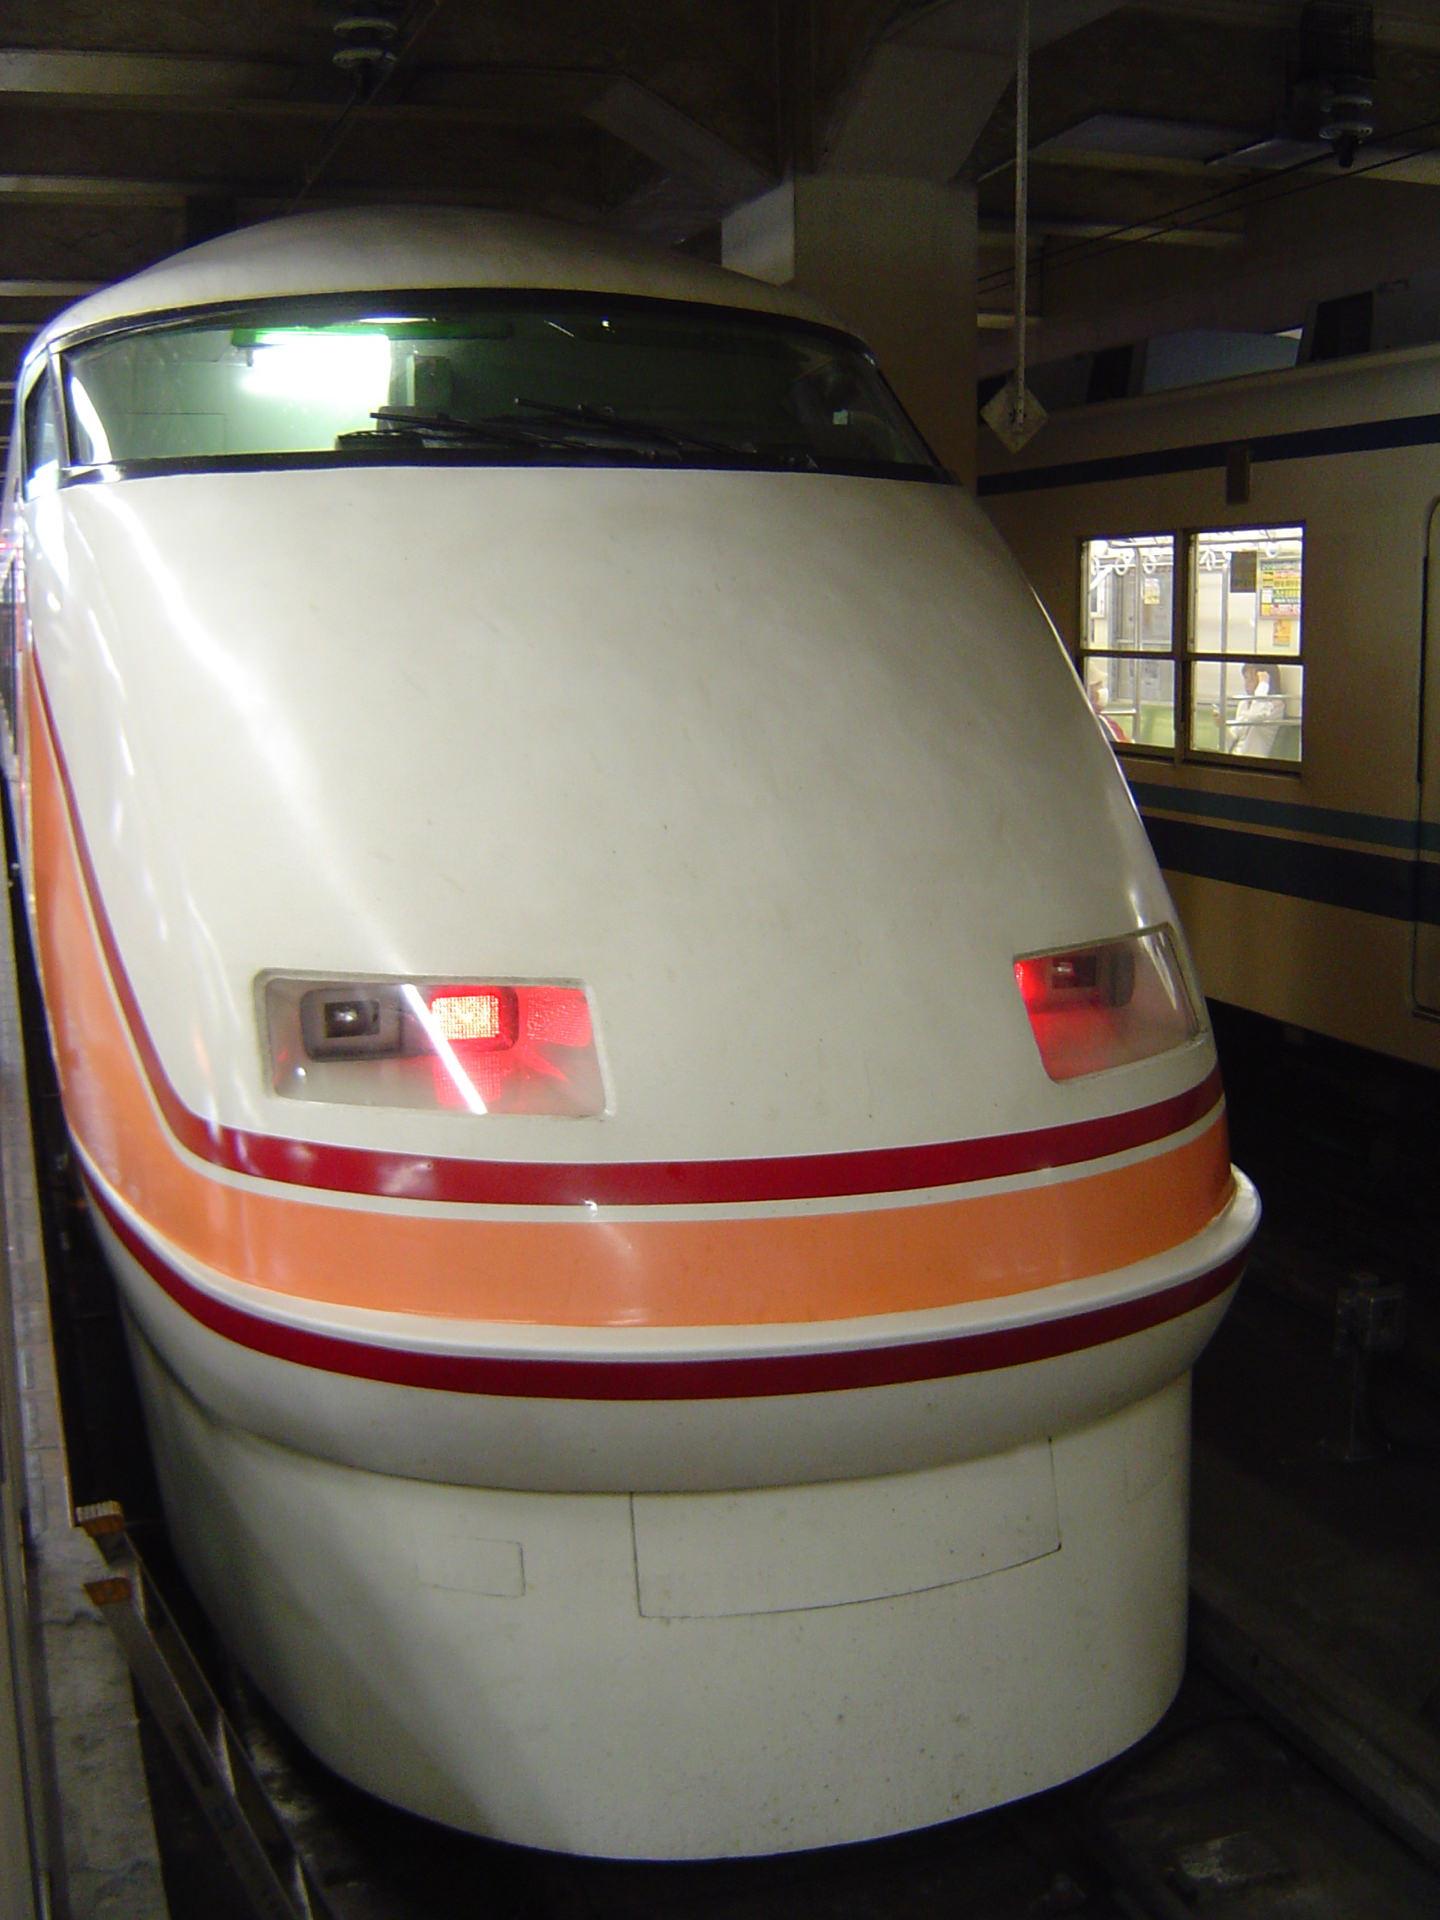 DSC-P8